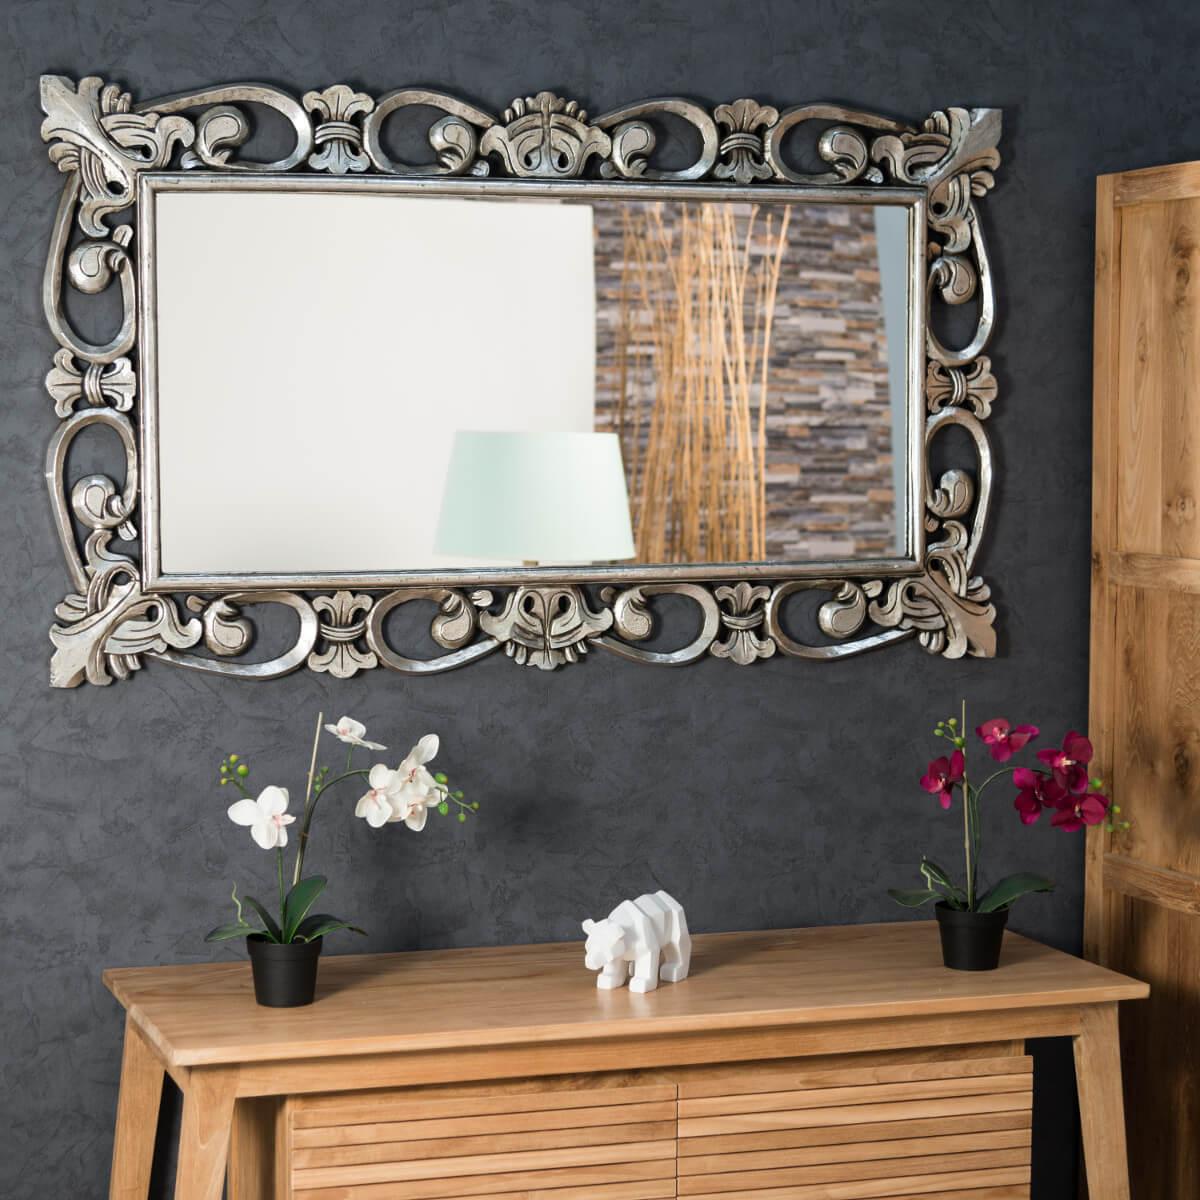 Espejo c rdoba de madera con p tina plateada 140 x 80 for Espejo 140 x 80